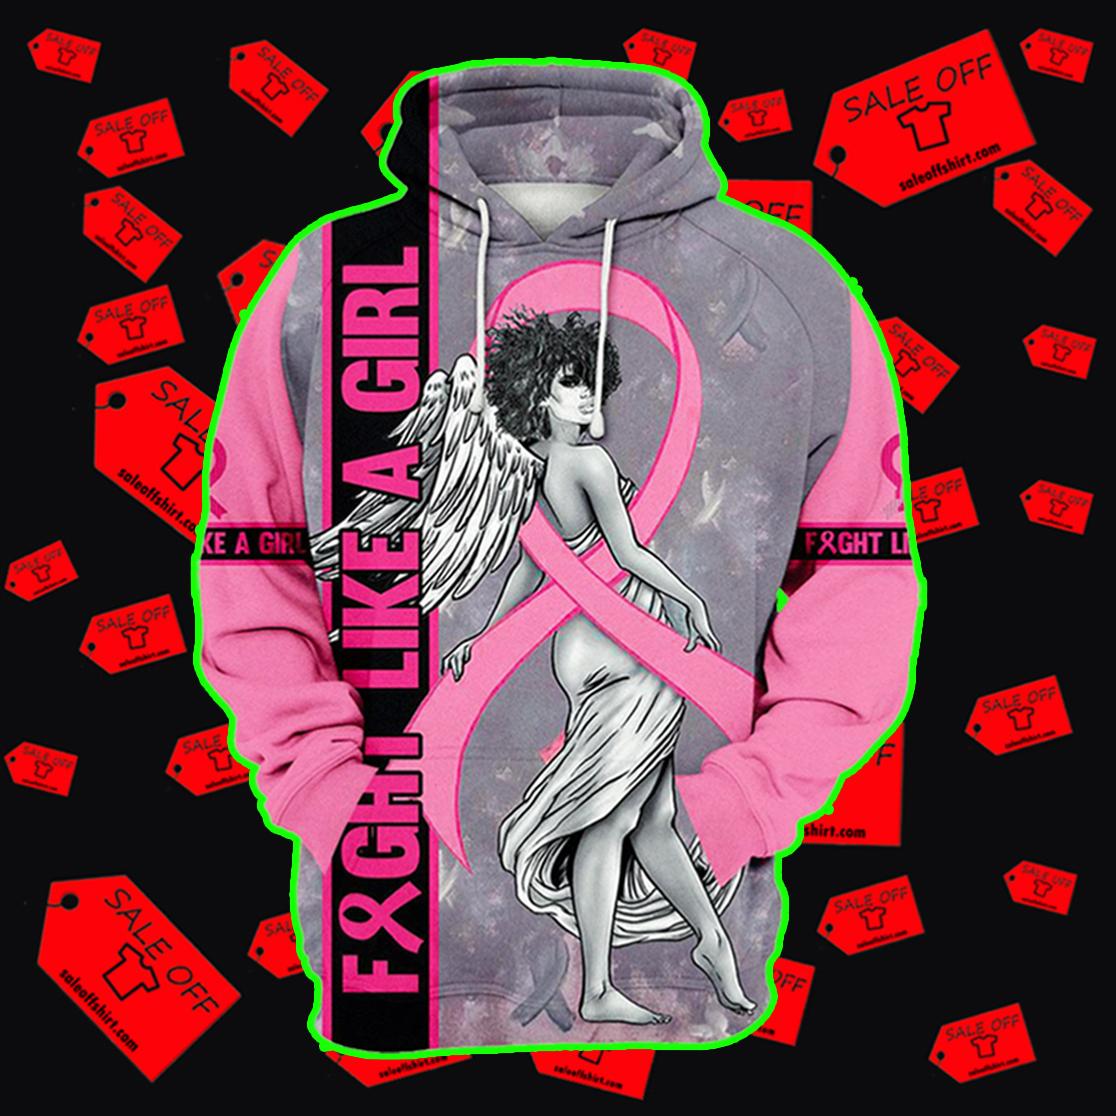 Fight Like A Girl Angel Breast Cancer Awareness Hoodie 3D, T-shirt 3D, Sweatshirt